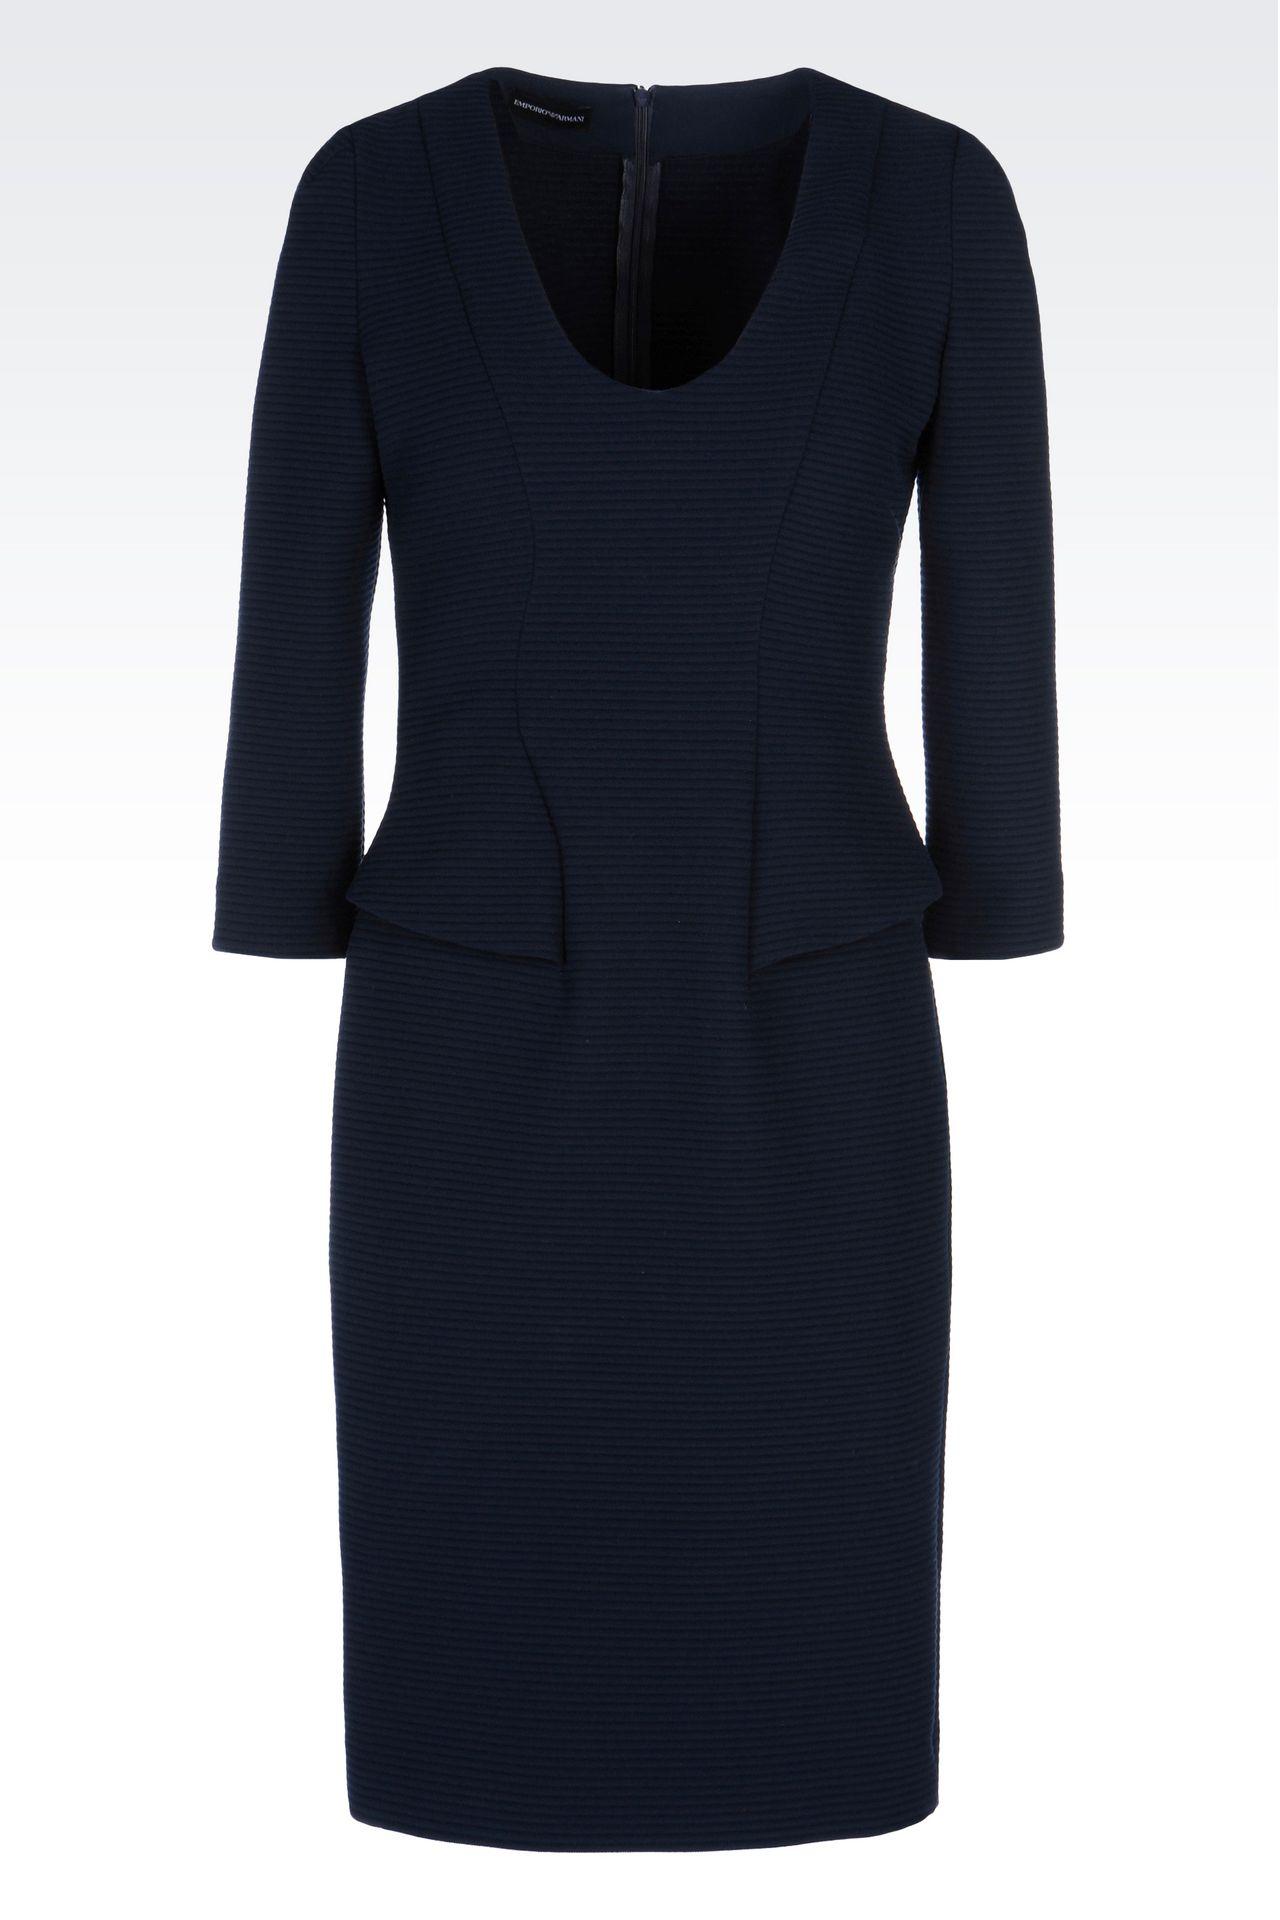 SHEATH IN VISCOSE BLEND: Short Dresses Women by Armani - 0